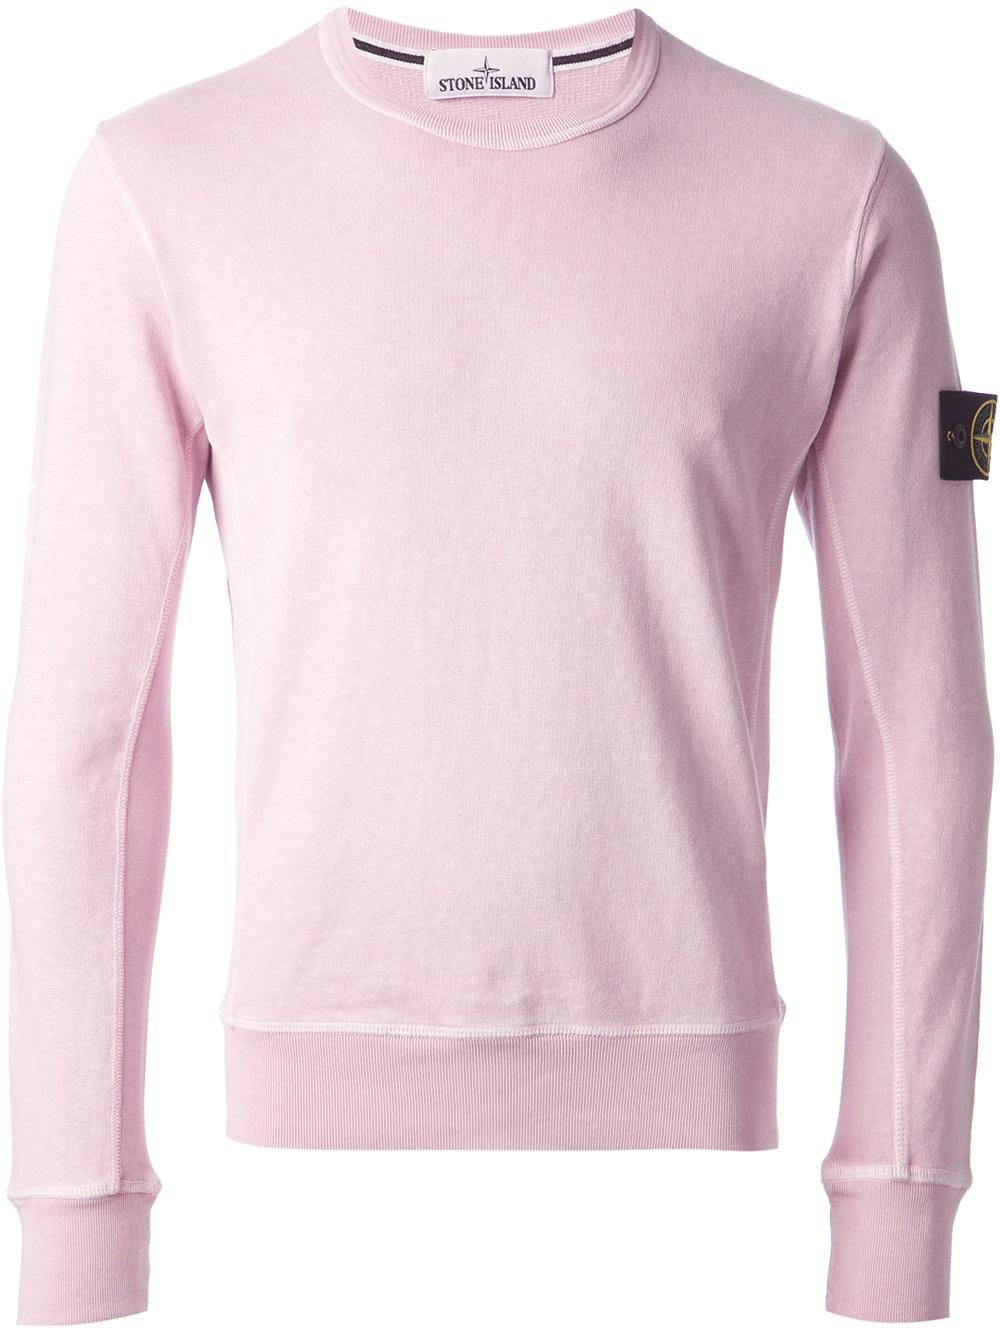 Stone island Logo Patch Sweatshirt in Pink for Men - Lyst